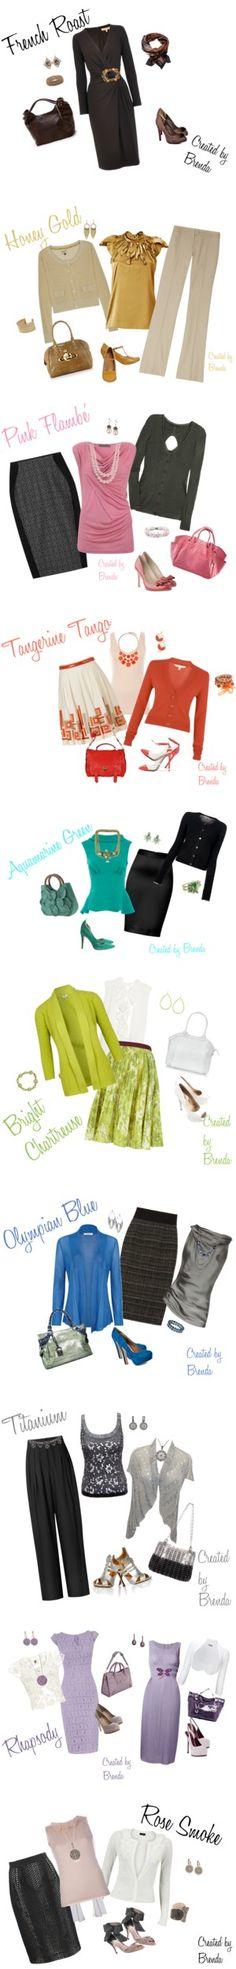 """Pantone Fall 2012 Color Picks"" by brendariley-1 on Polyvore"